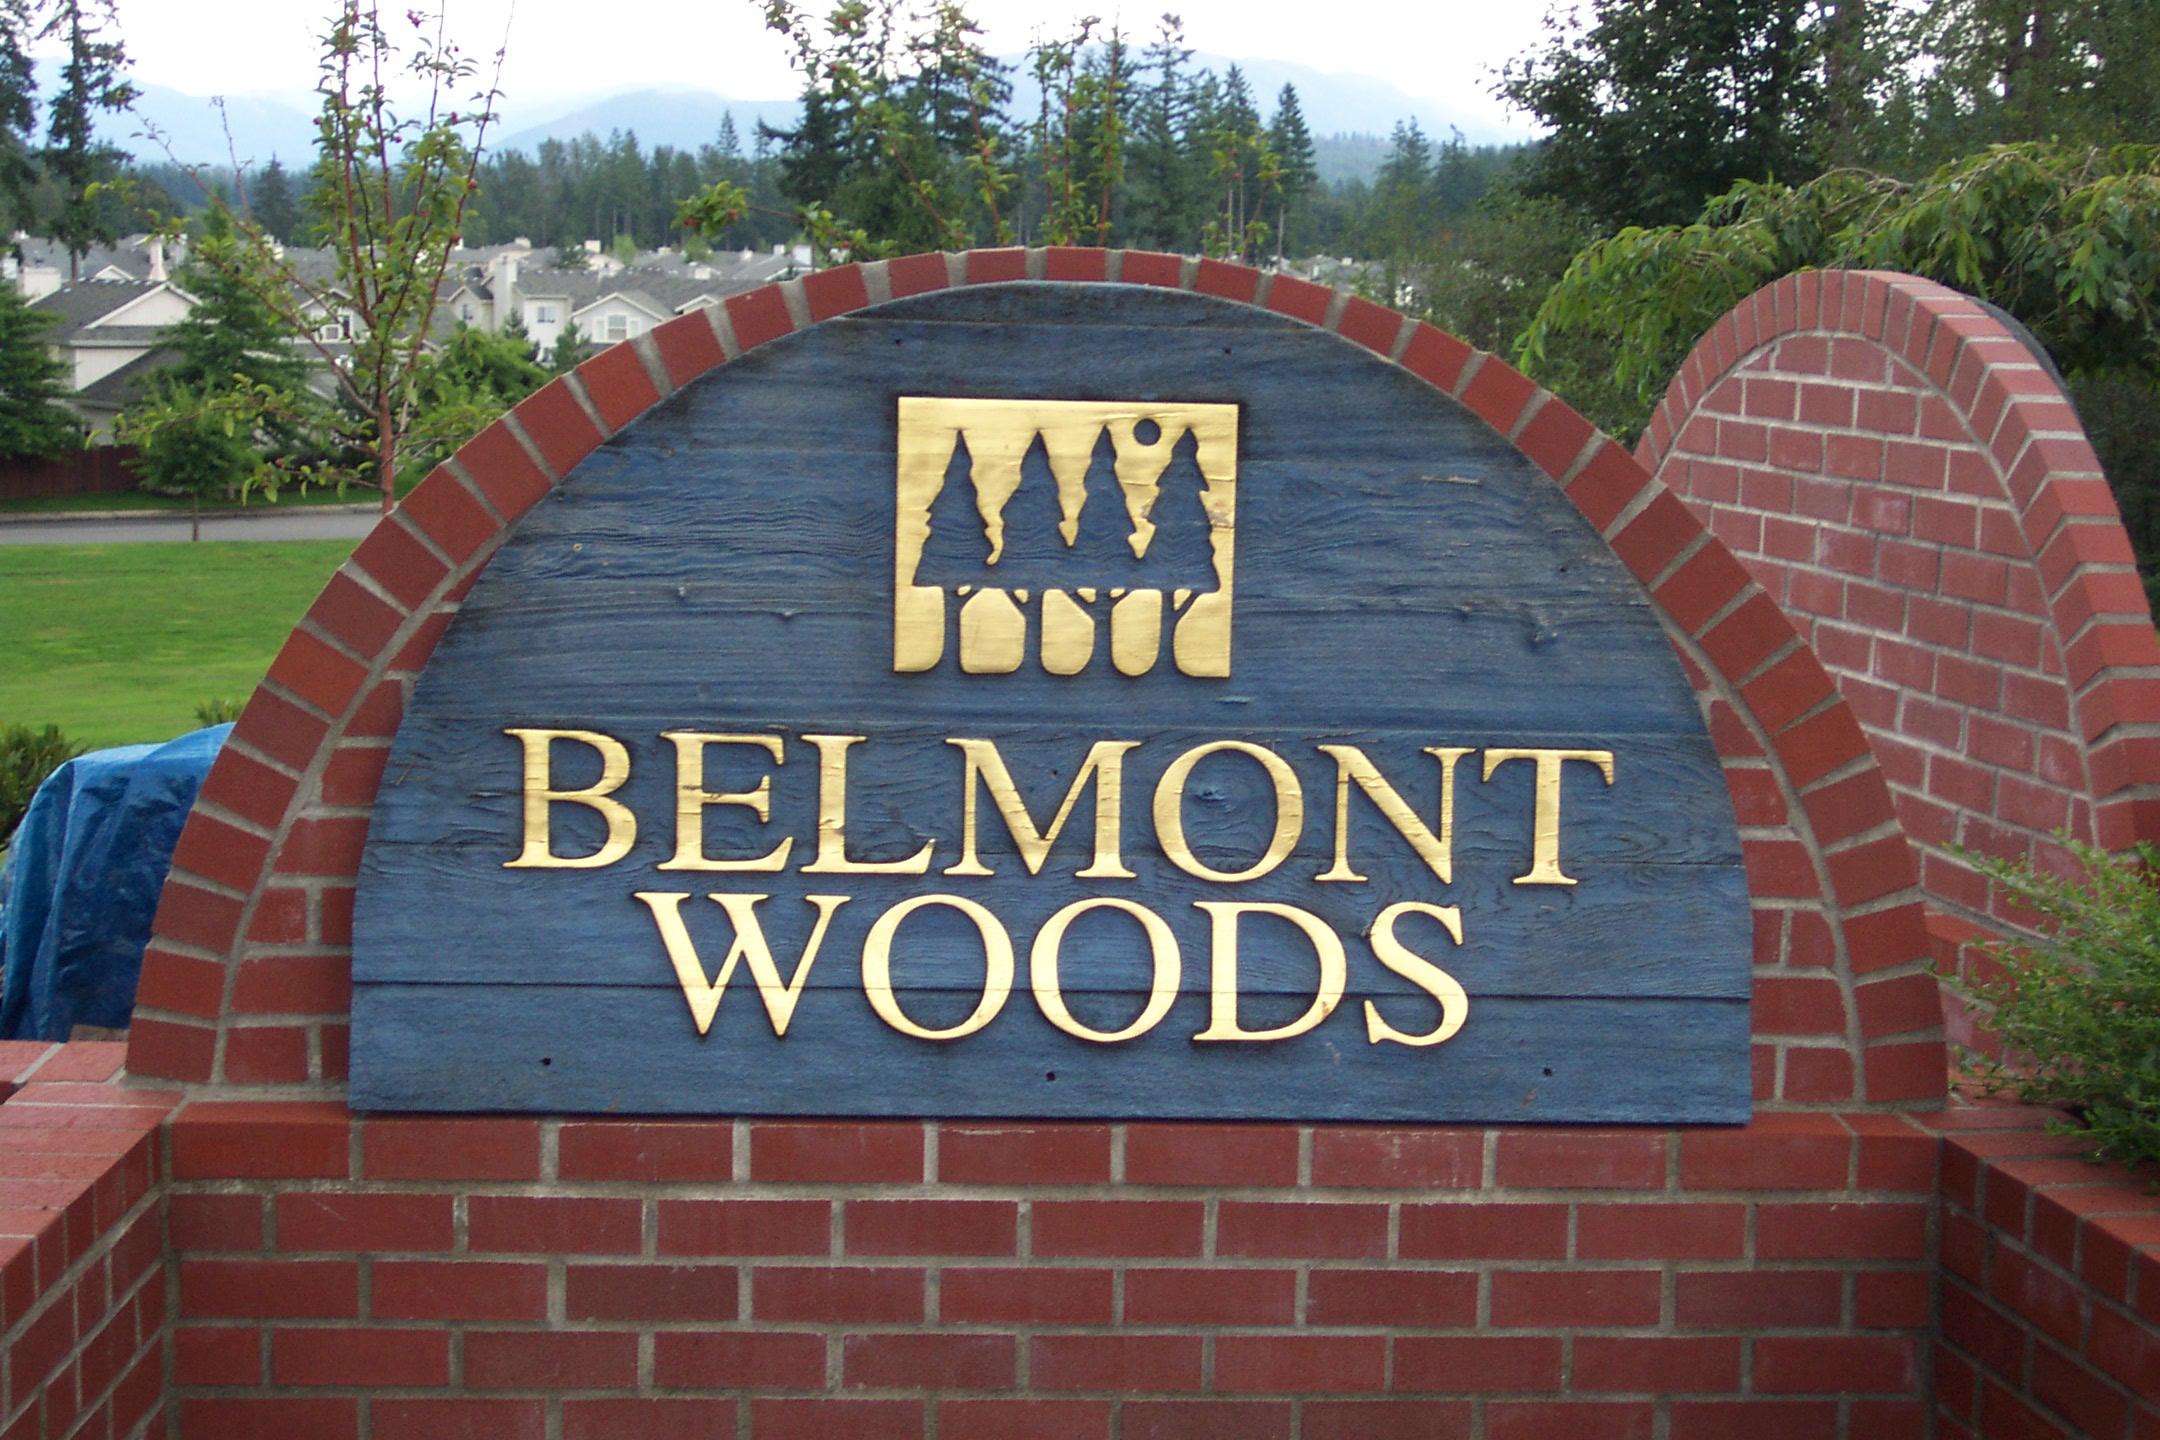 Belmont woods 009